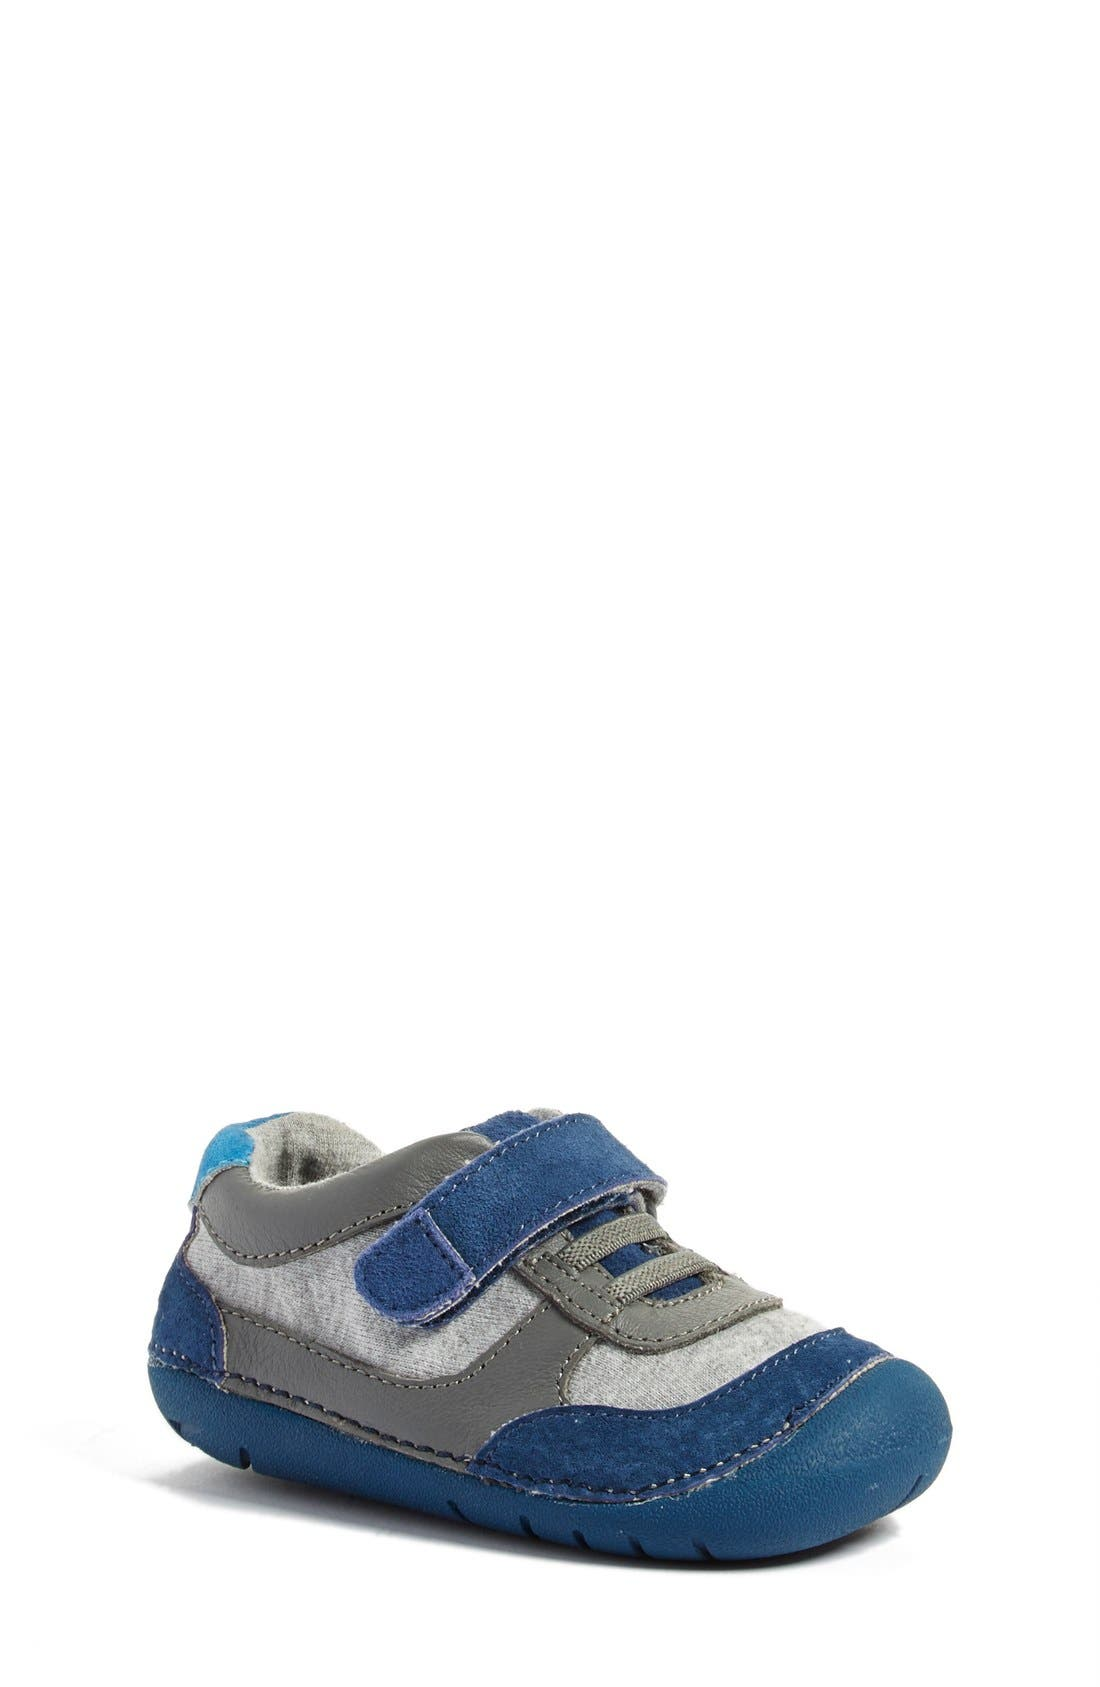 'Quinn' Sneaker,                             Main thumbnail 1, color,                             400